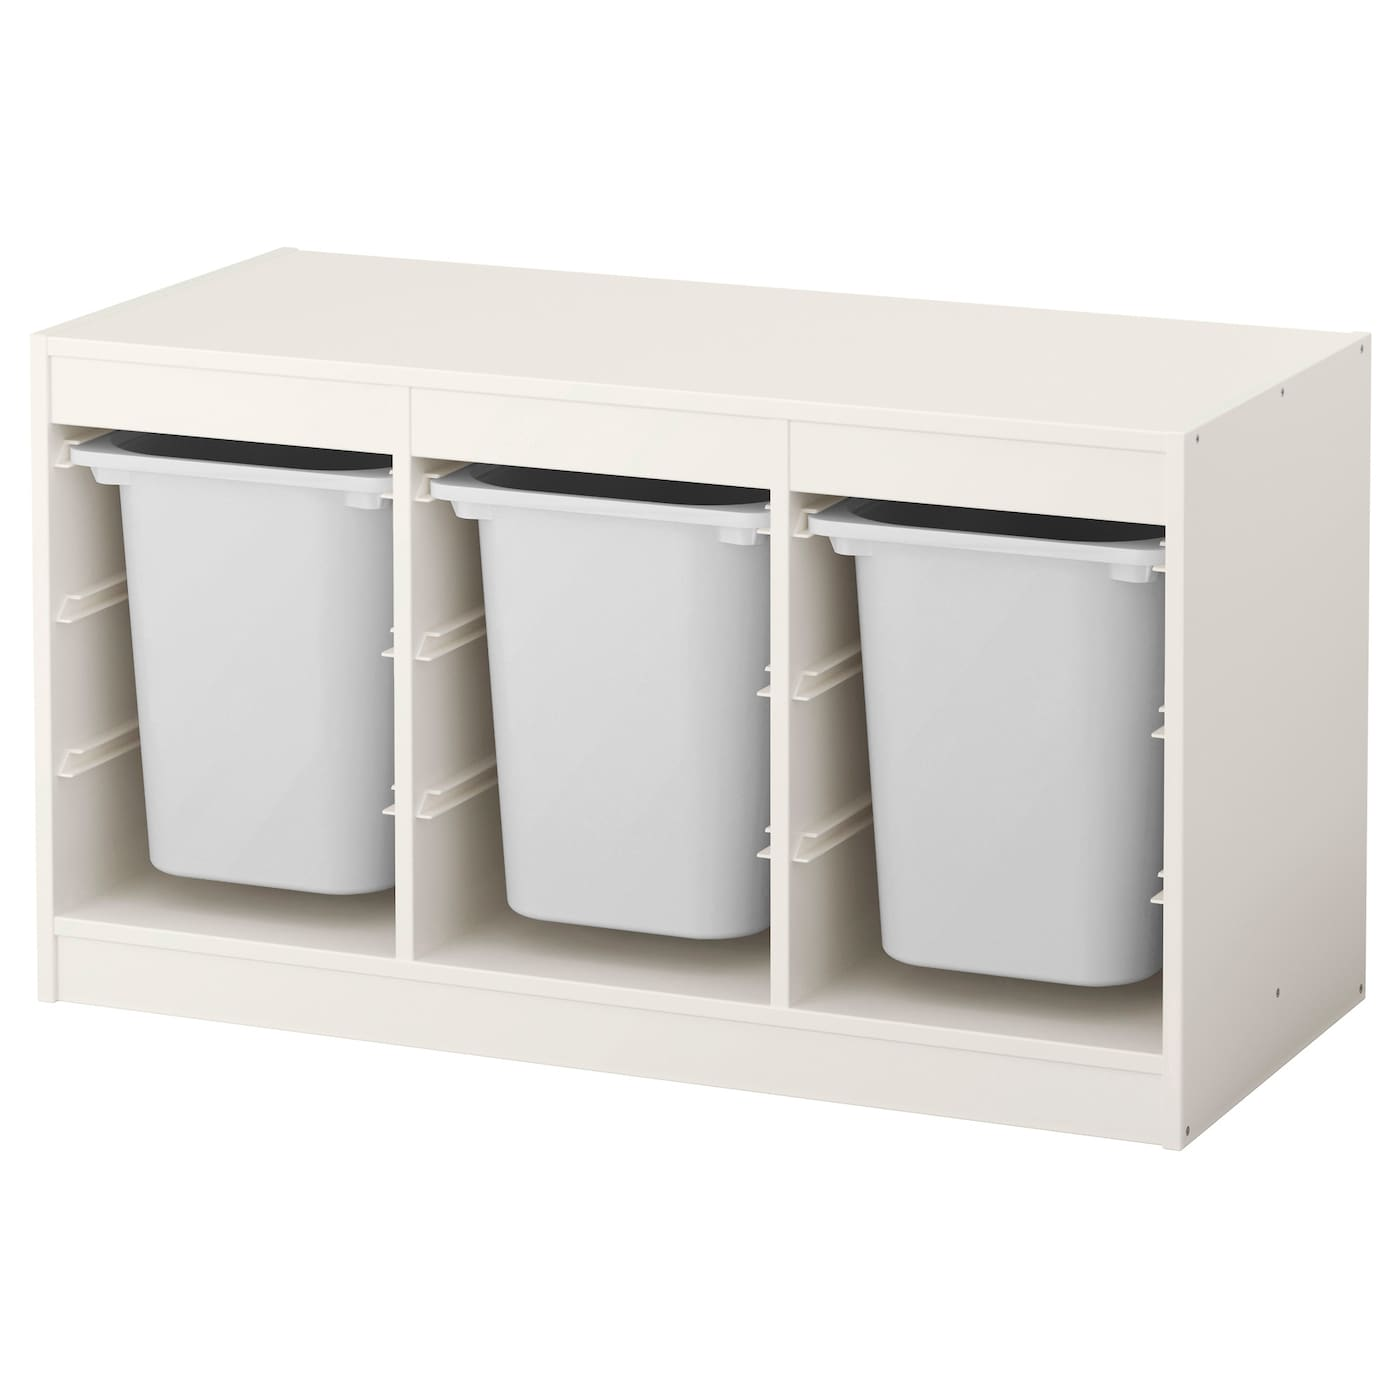 Trofast rangements jouets combinaisons ikea - Ikea heure d ouverture ...